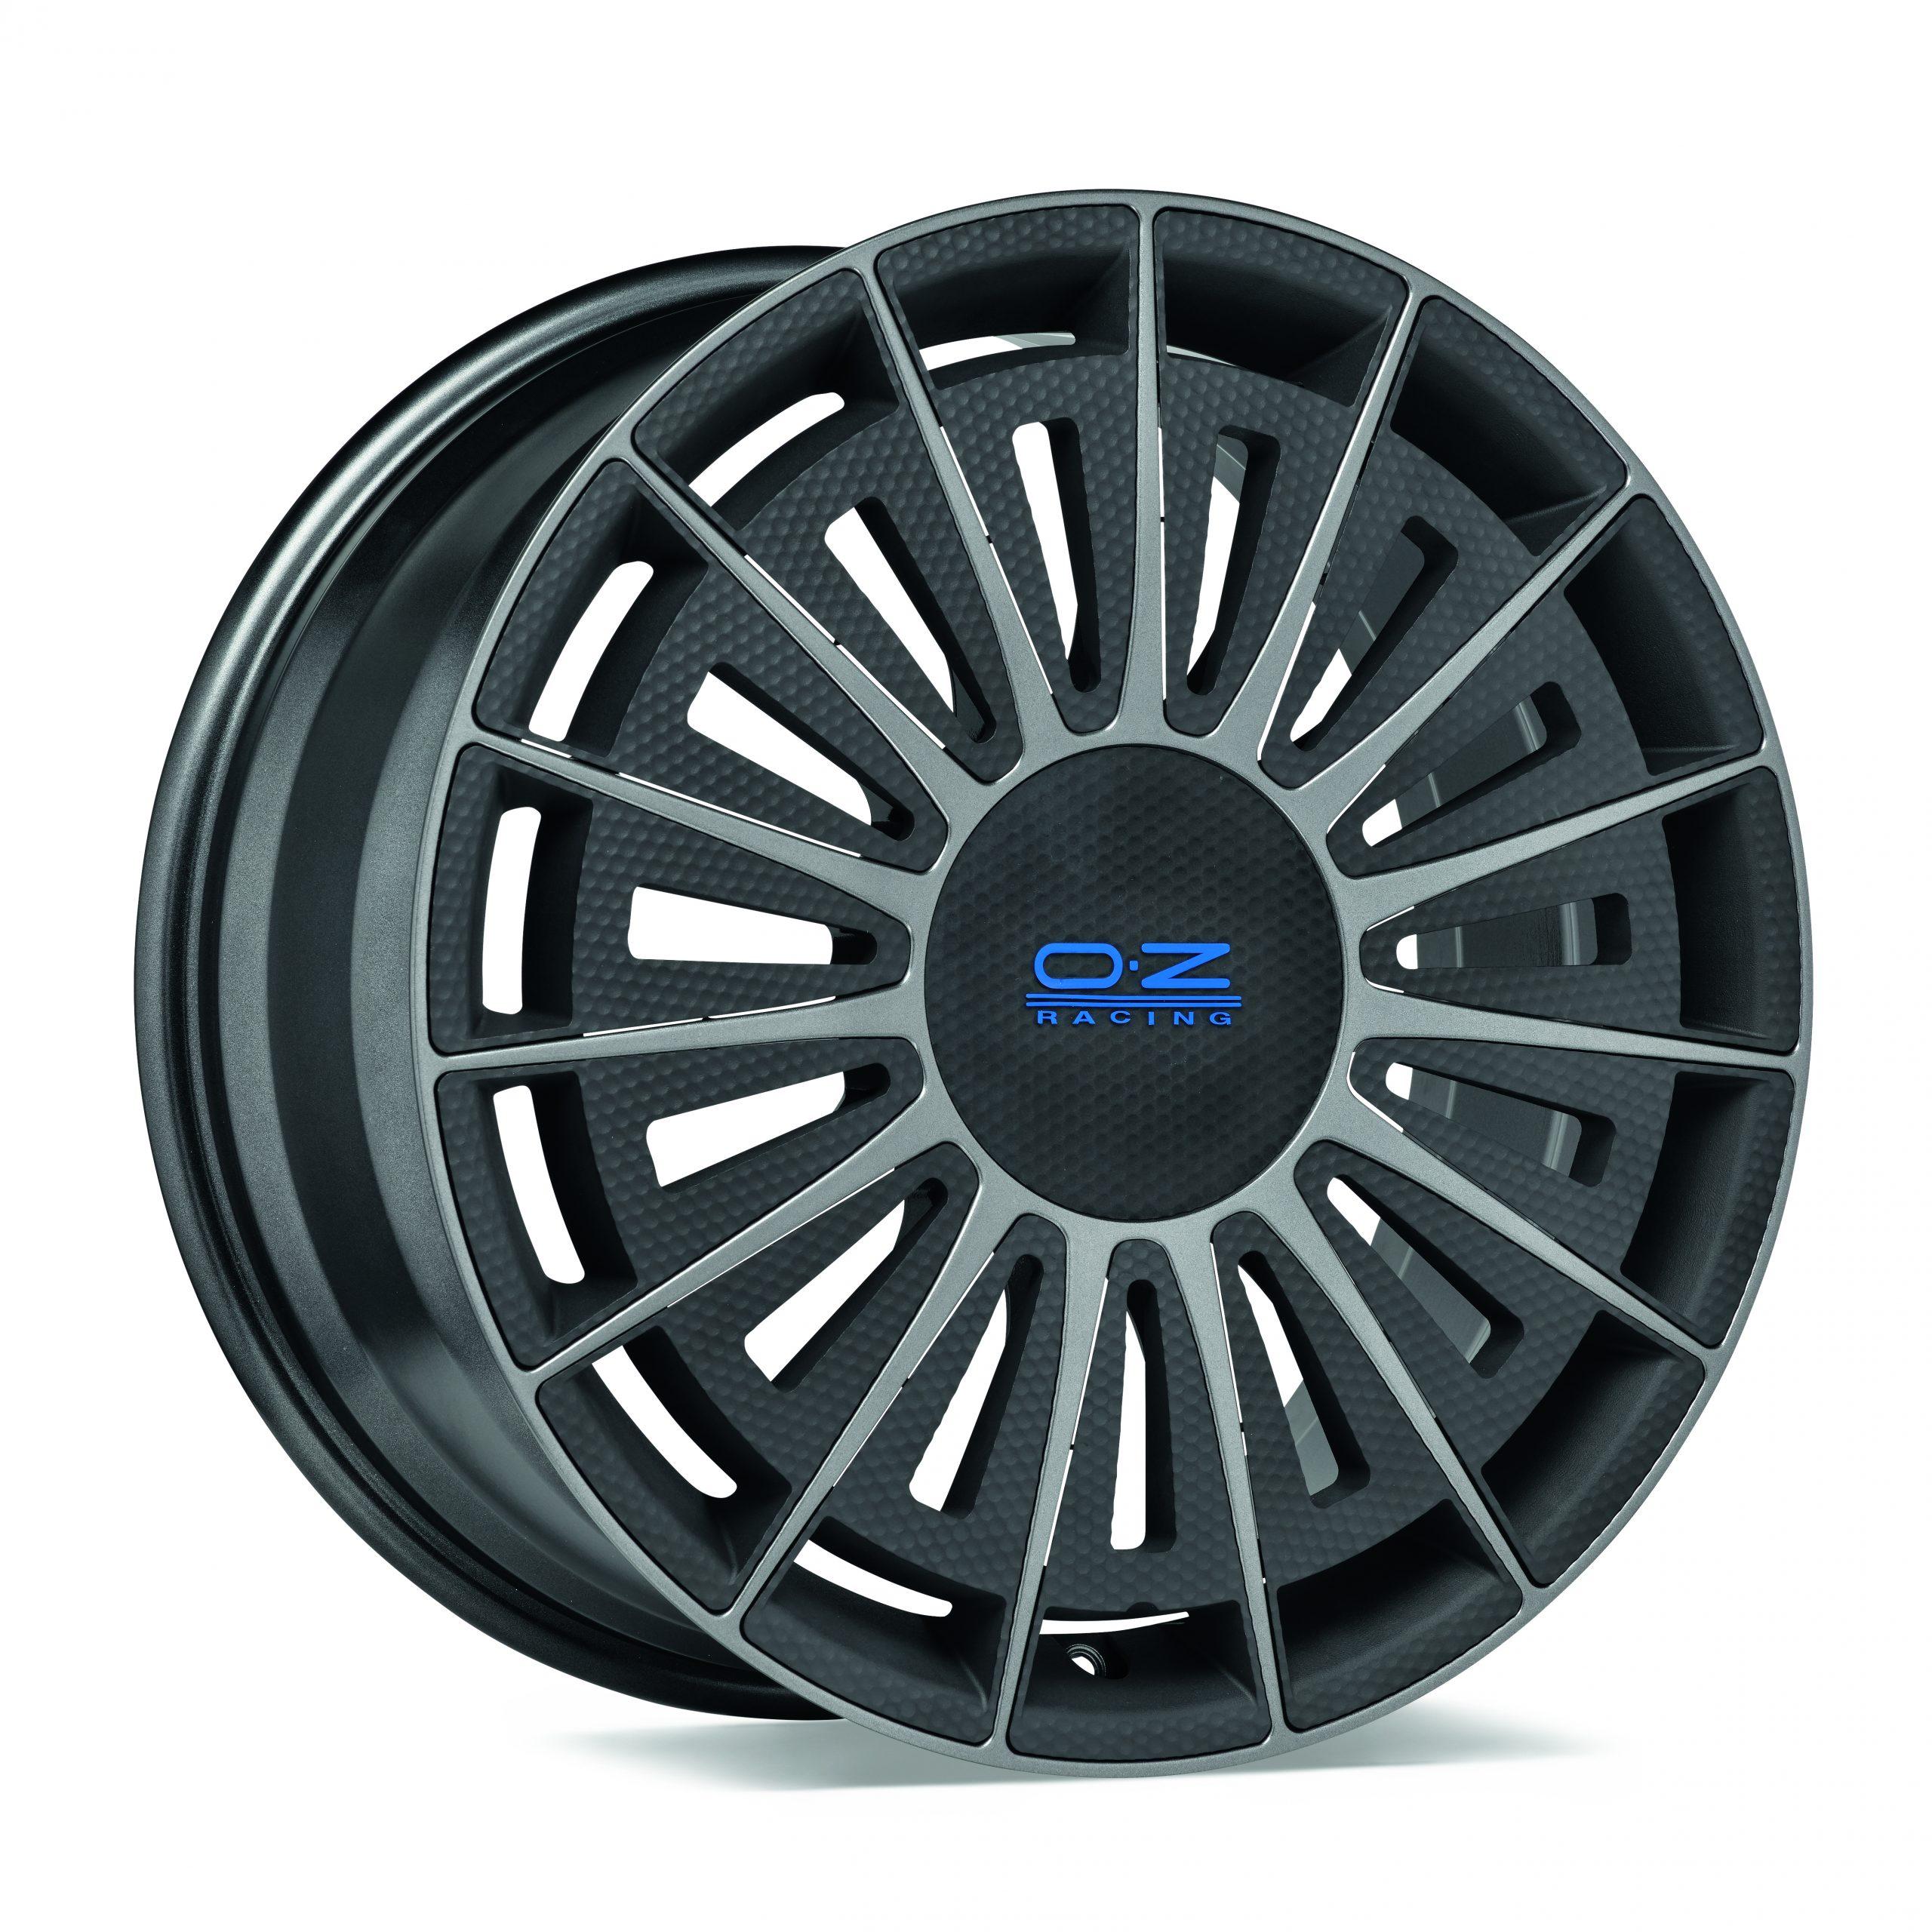 OZがEV専用ホイール『Superturismo AERO-e』を2021年中に製品化予定